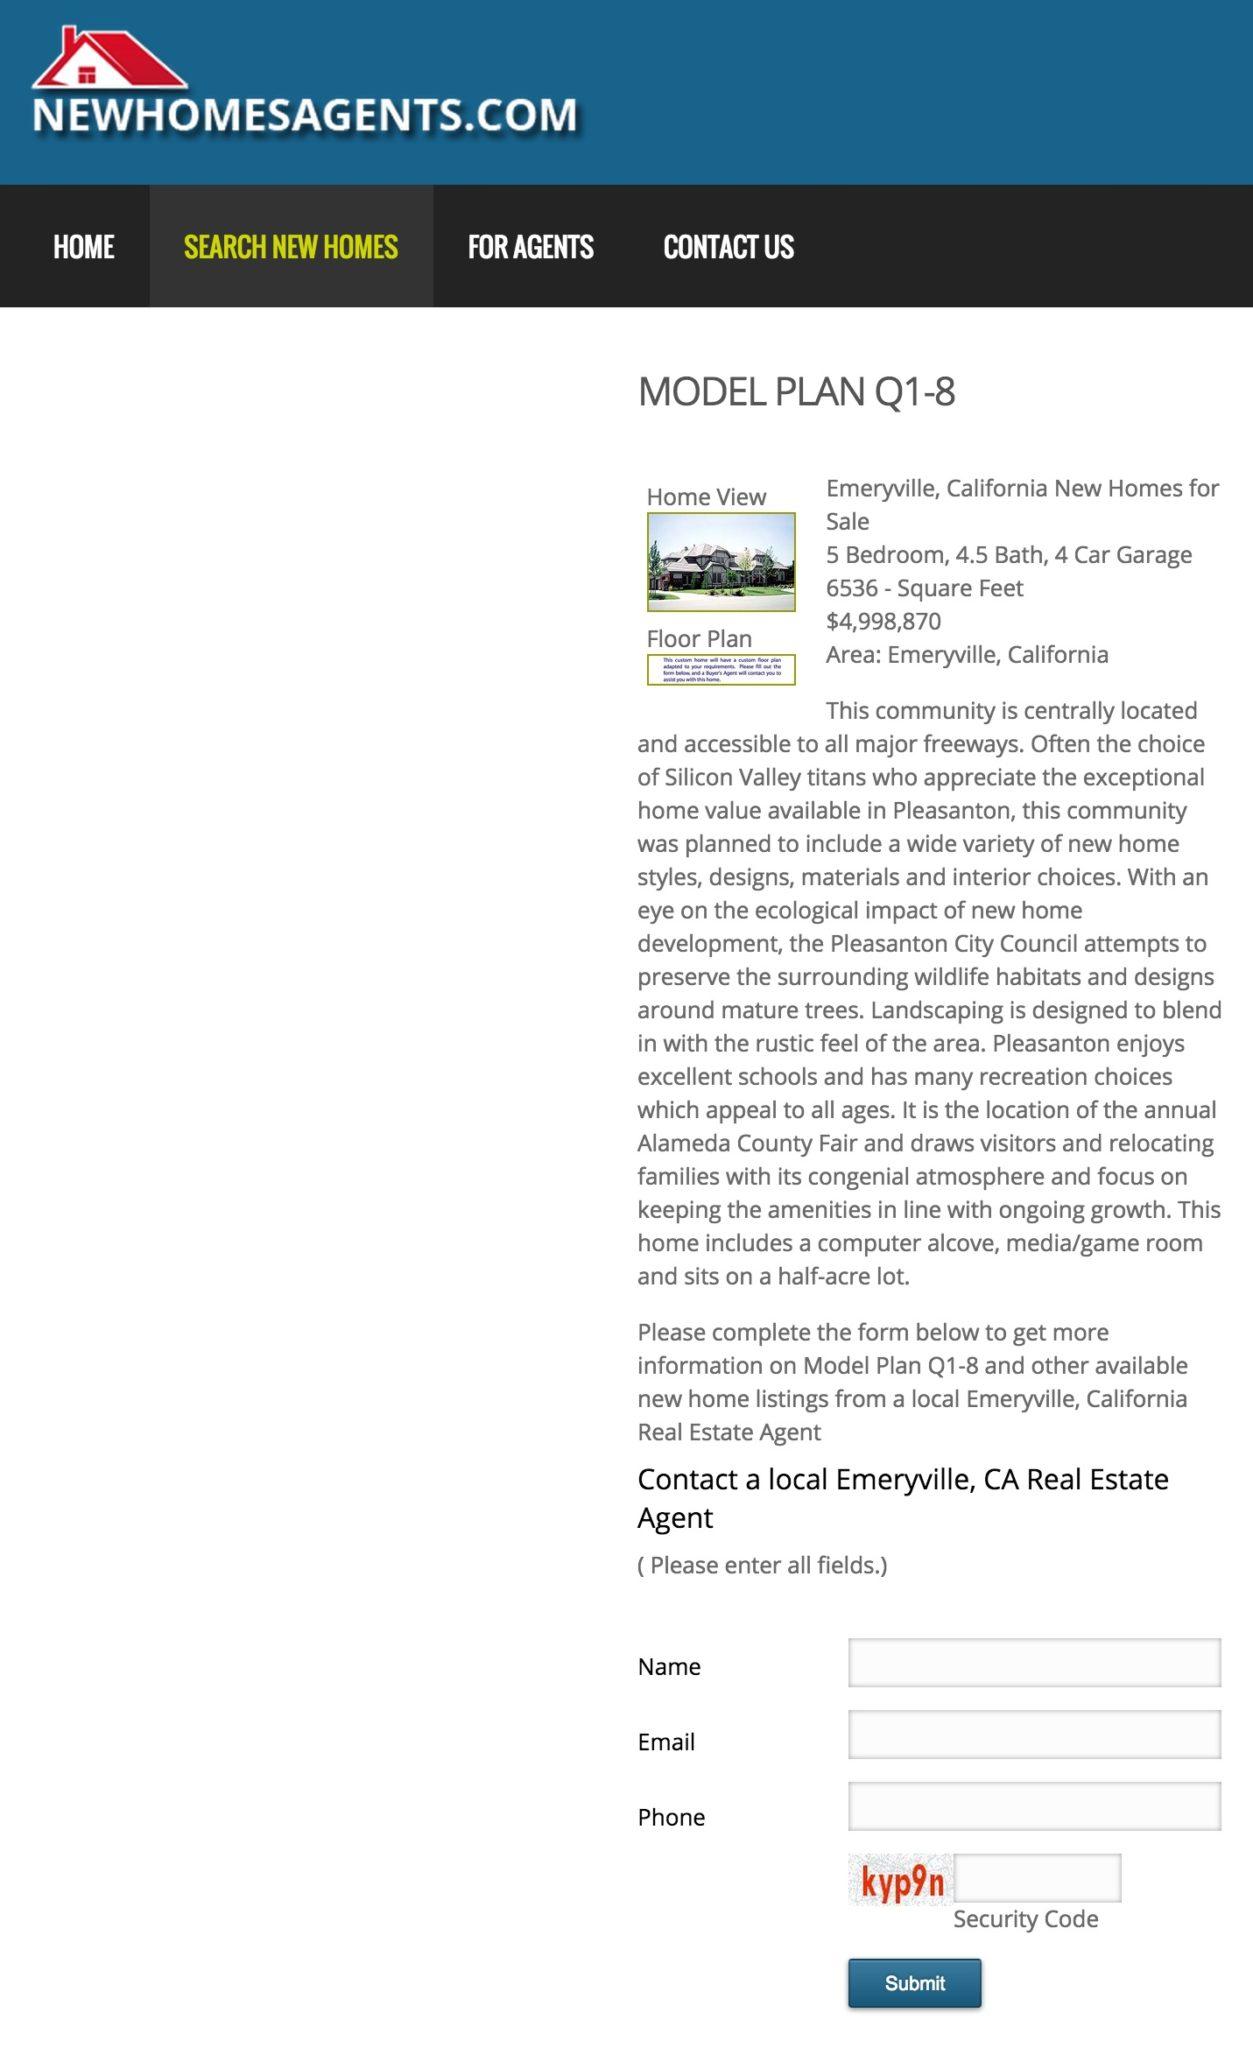 screencapture-newhomesagents-com-california-california_emeryville_new_homes-html-ID-7452-1440985639157